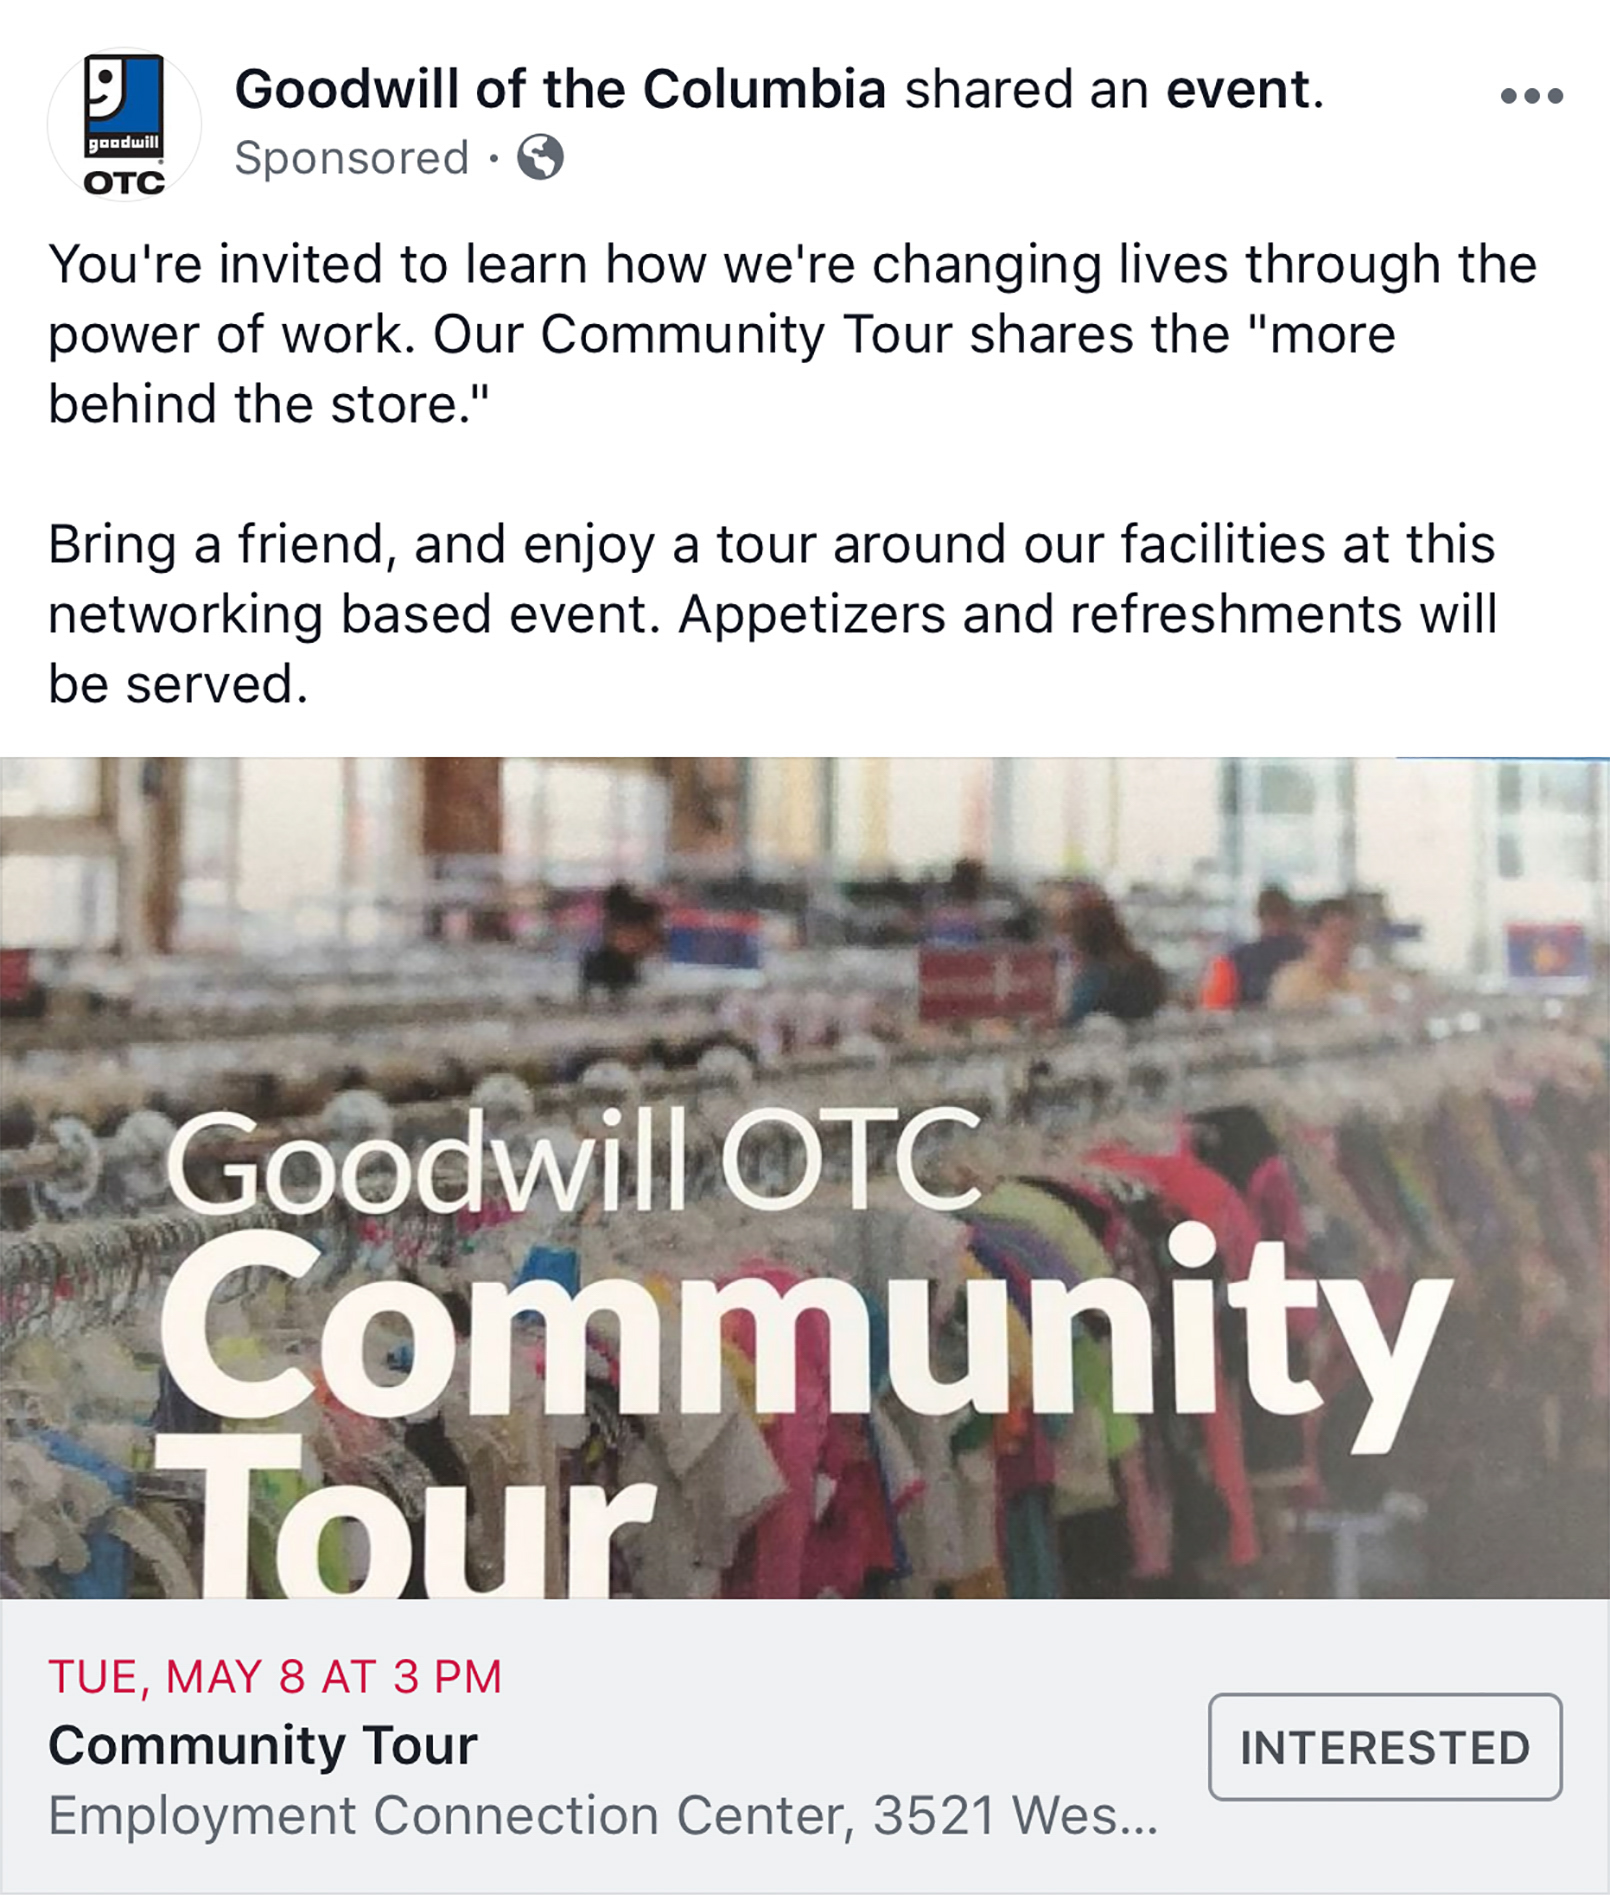 Goodwill Social Media Feature